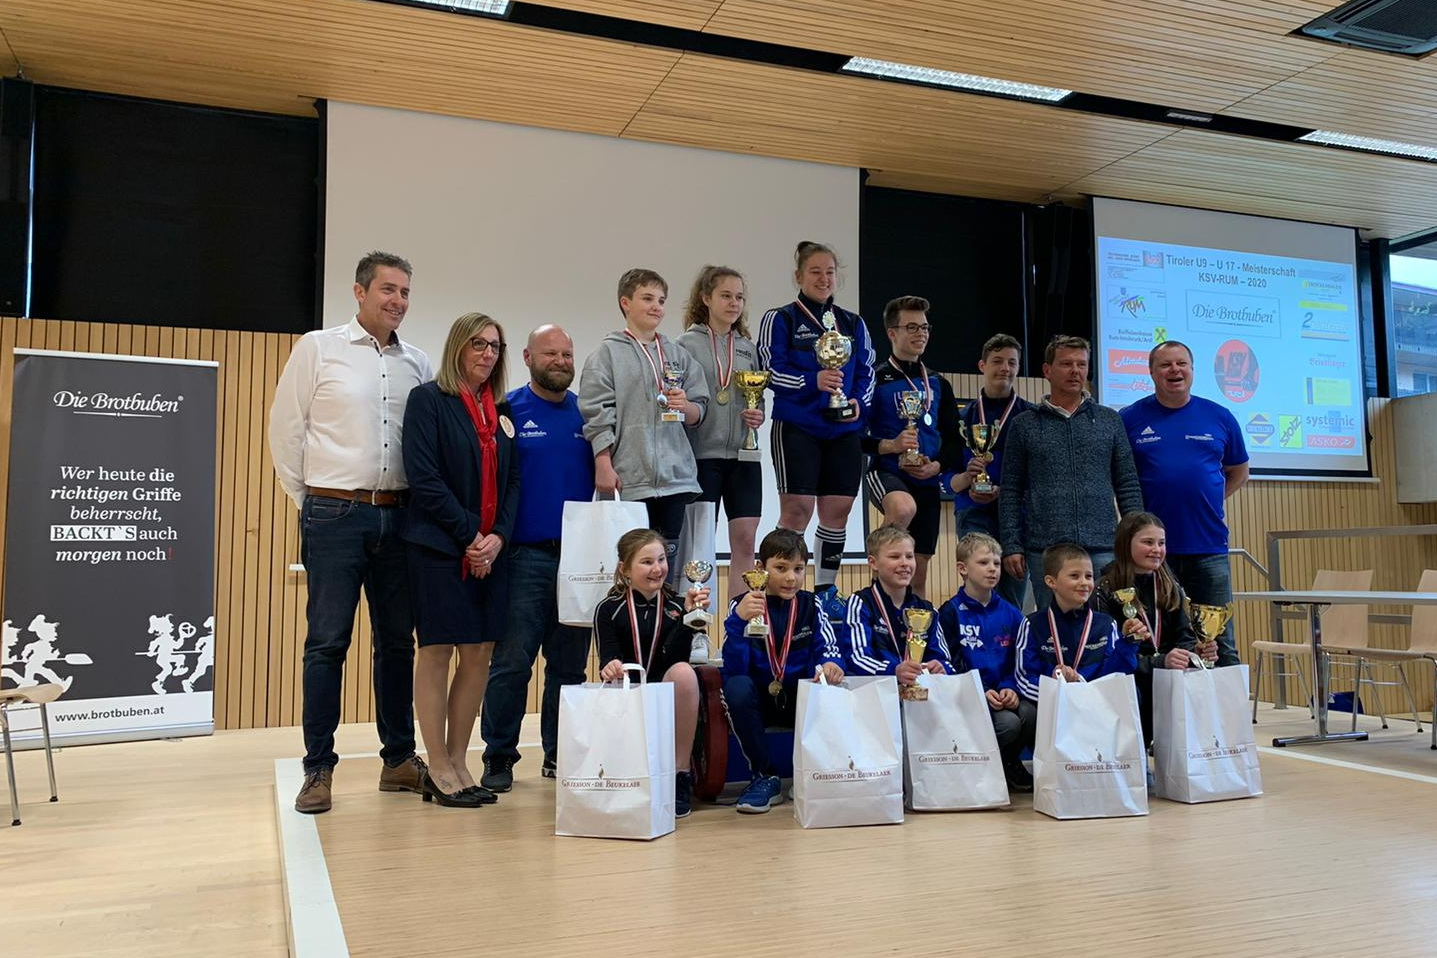 07.03.2020 - Erfolgreicher Tiroler Schüler- und Jugendmeisterschaften